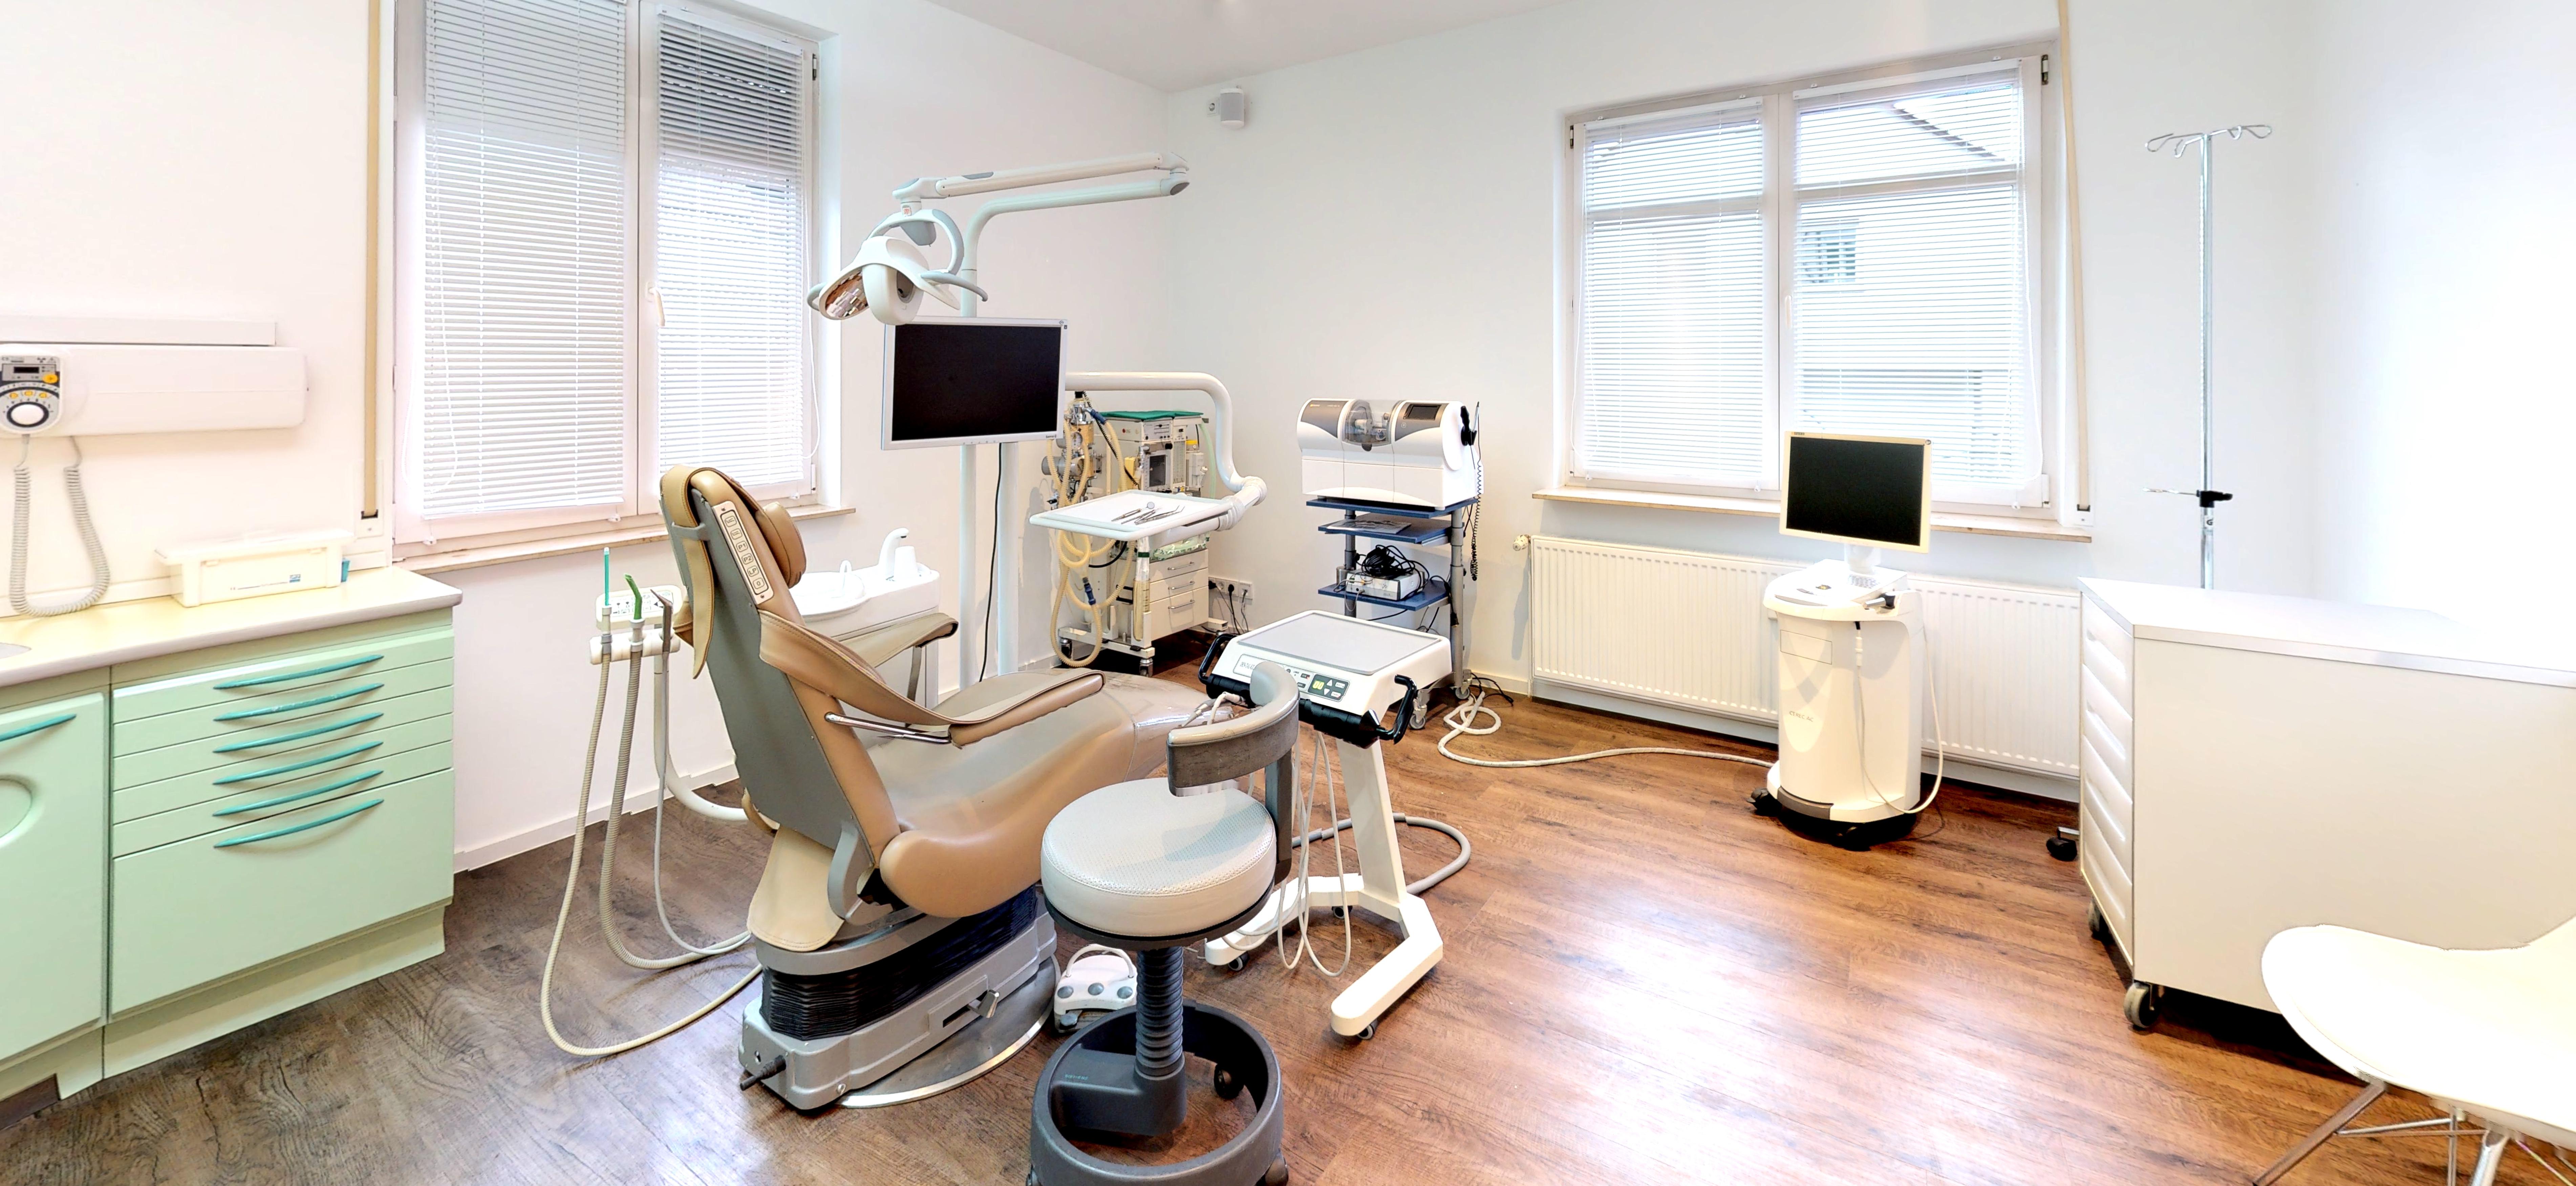 Dental-Fabrik-Photo-3